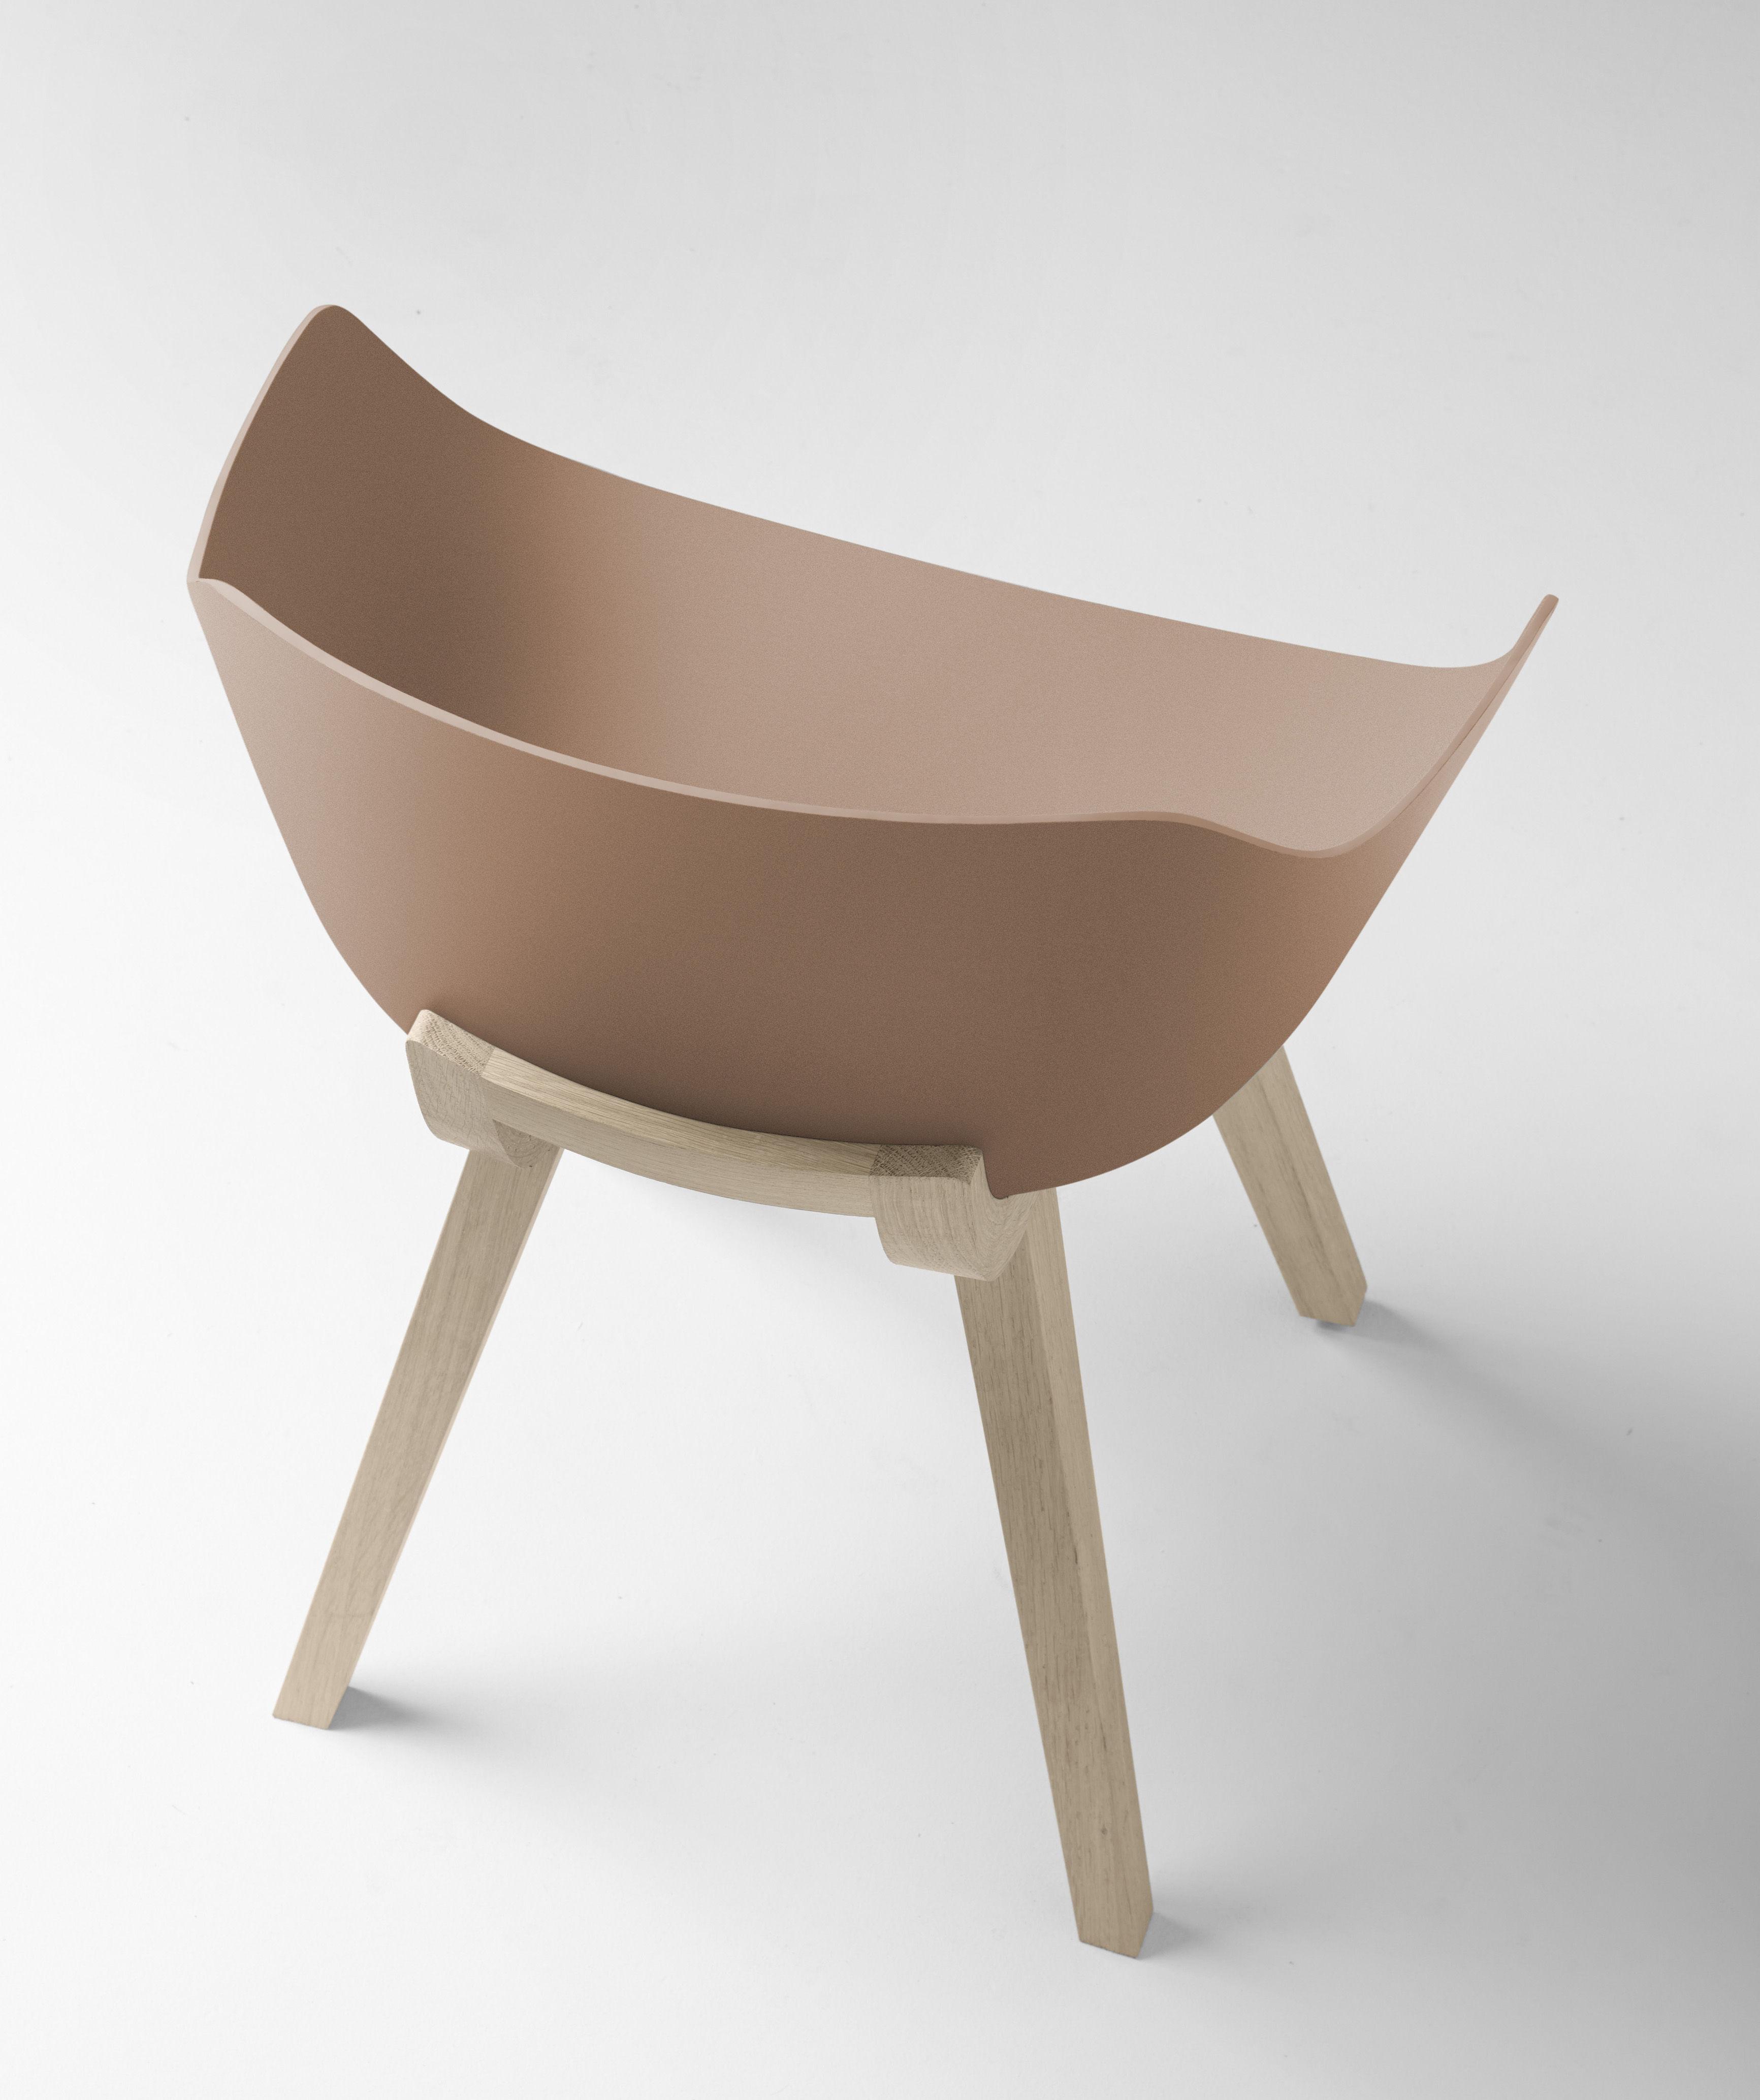 kuskoa bi bio kunststoff stuhlbeine aus holz alki sessel. Black Bedroom Furniture Sets. Home Design Ideas